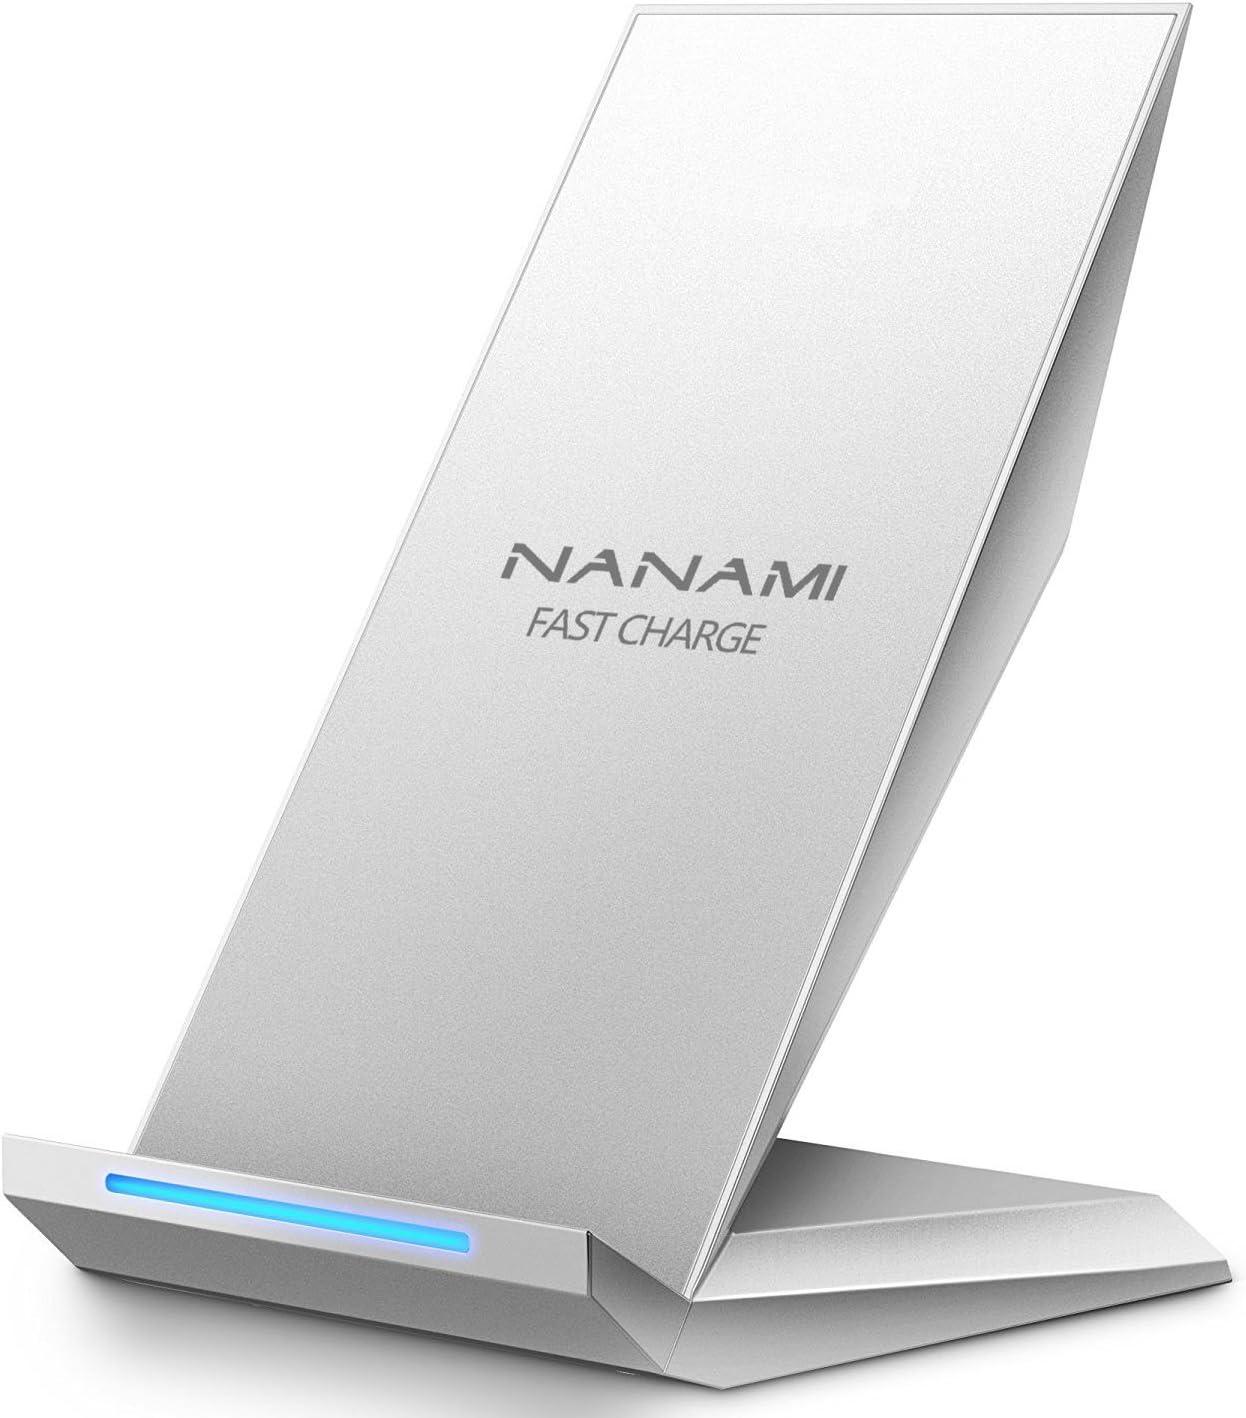 NANAMI Cargador Inalámbrico Rápido,Qi Inalámbrica Carga Rápida 10W y Estándar 5W para iPhone 11/11 Pro/XS/XS MAX/XR/X/8 Plus/8,Wireless Quick Charger para Samsung Galaxy S20 S10 S9 S8 Plus S8 S7 Note8